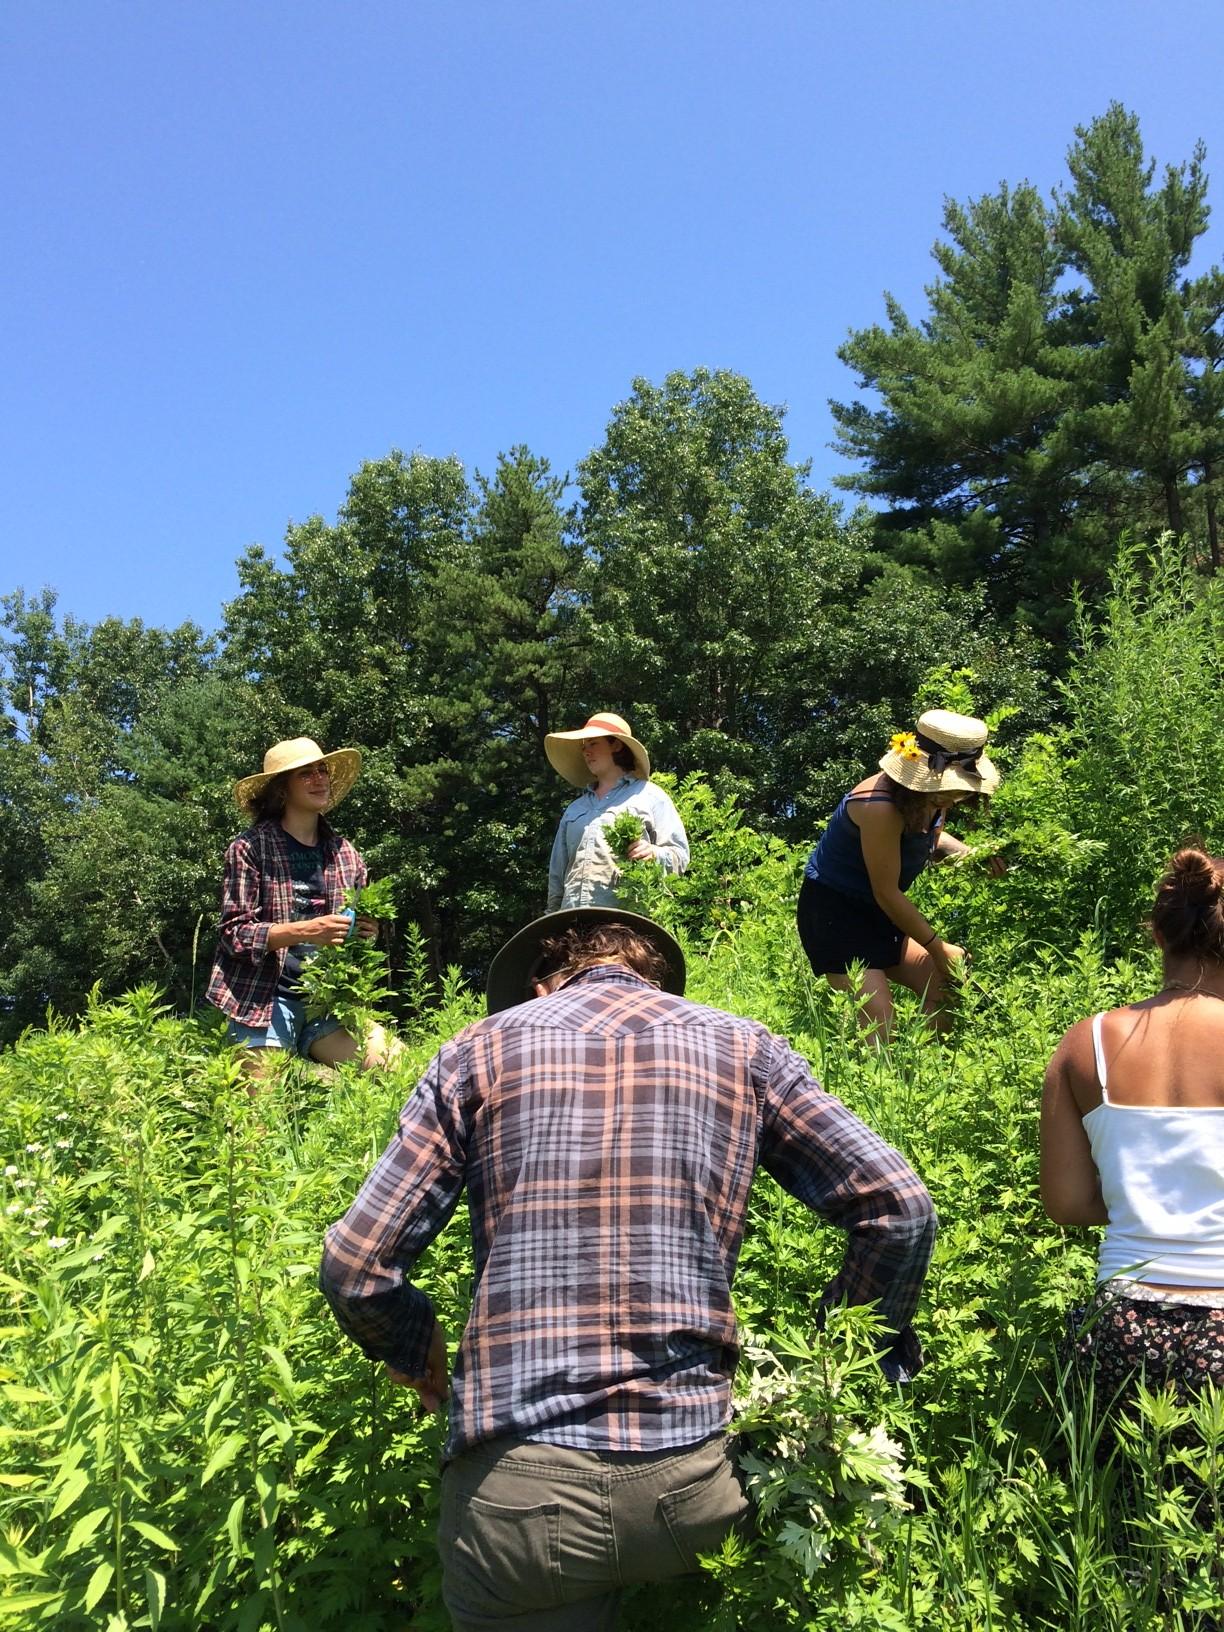 Wildcrafting: Wildcraft herbs responsibly